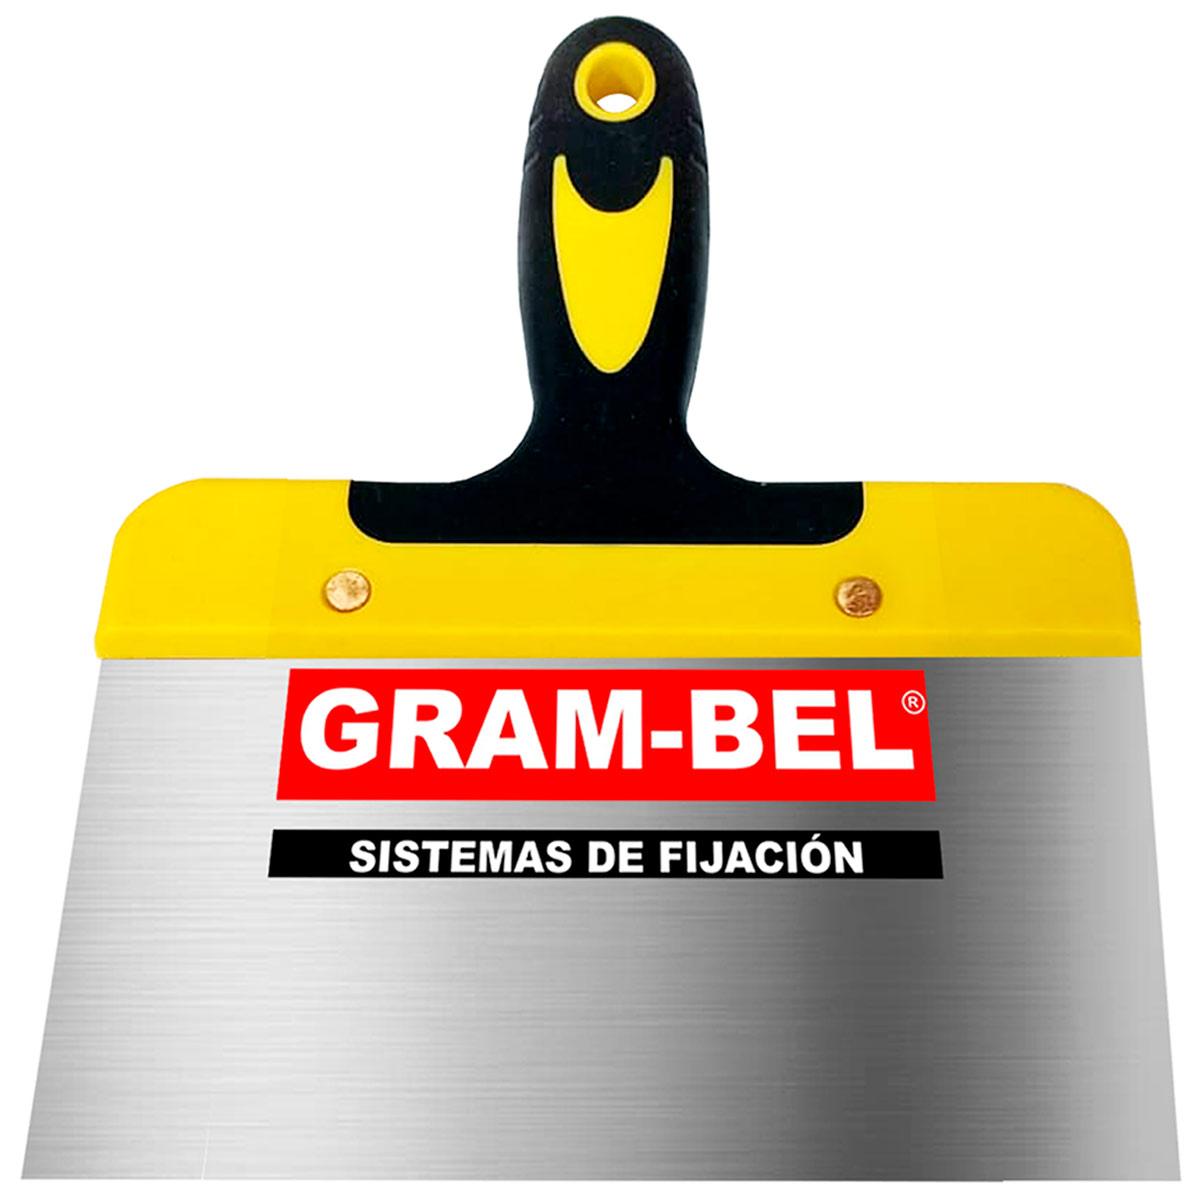 Espatula Flexible Multifuncional 6IN Pintura Mezcla Gram-bel